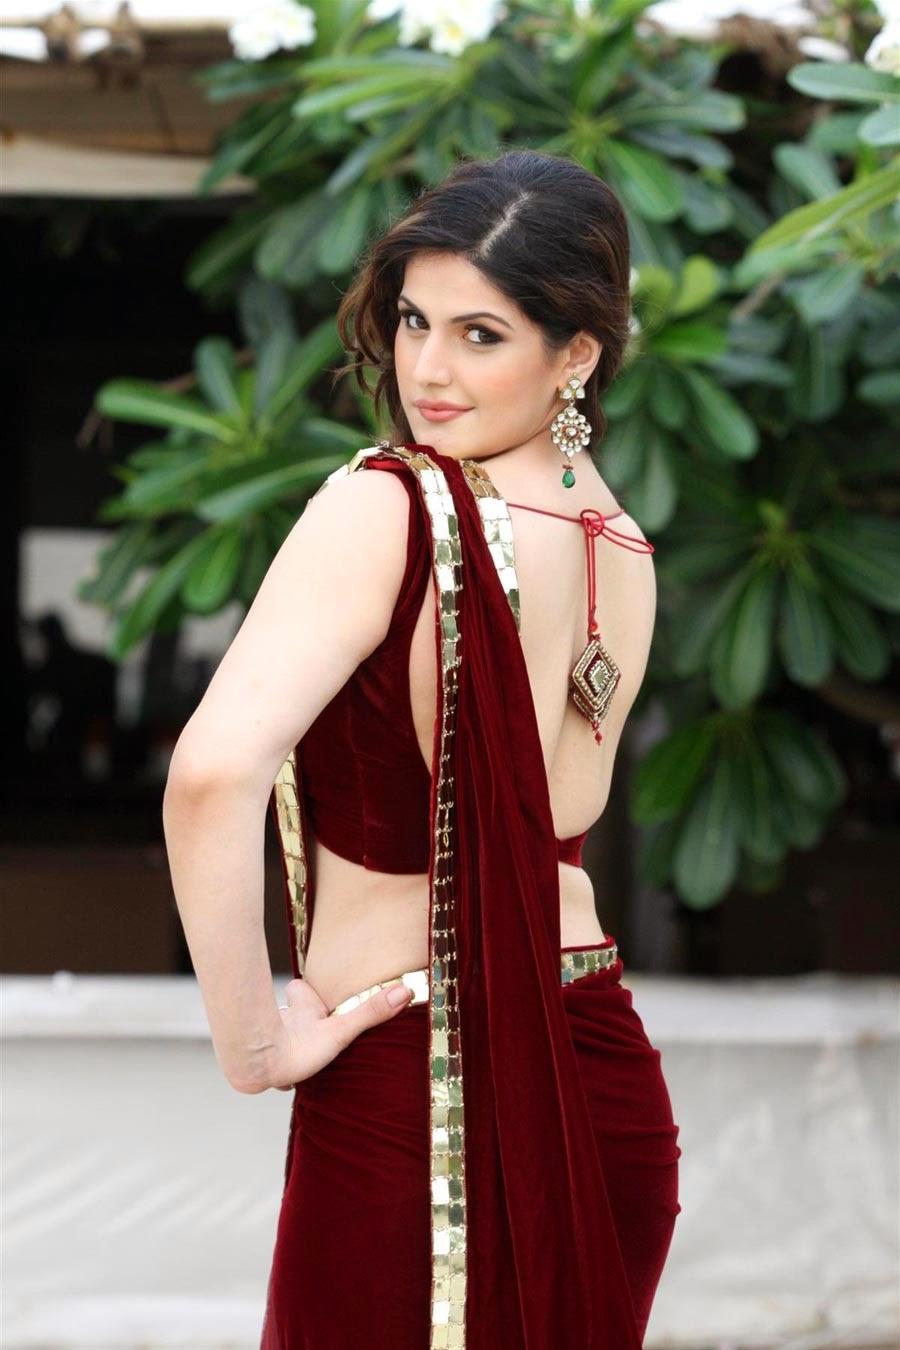 Zarine Khan Hottest Pics